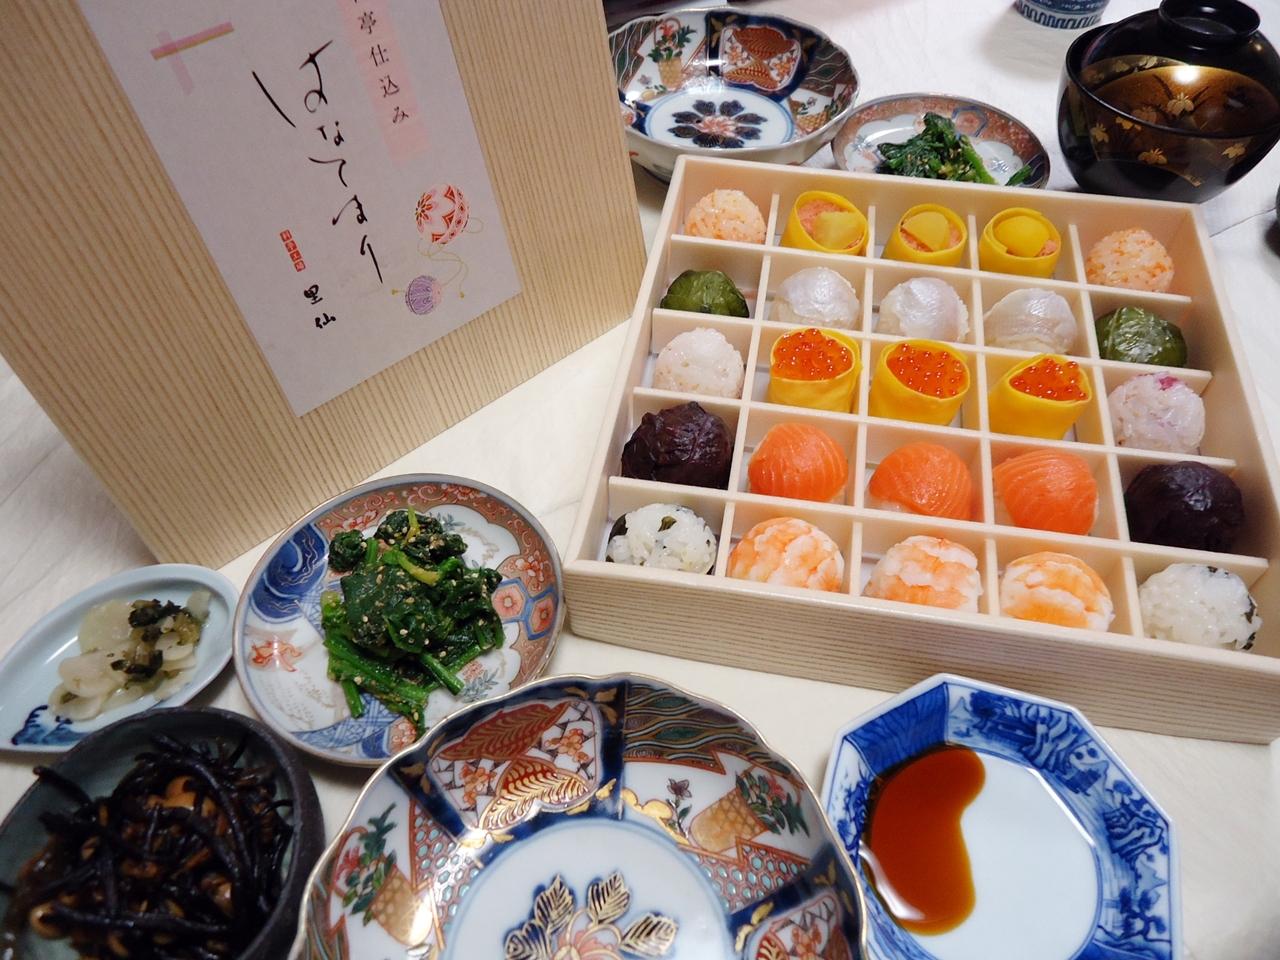 http://gift.tsuu.info/food/img/20130509DSC00288.JPG